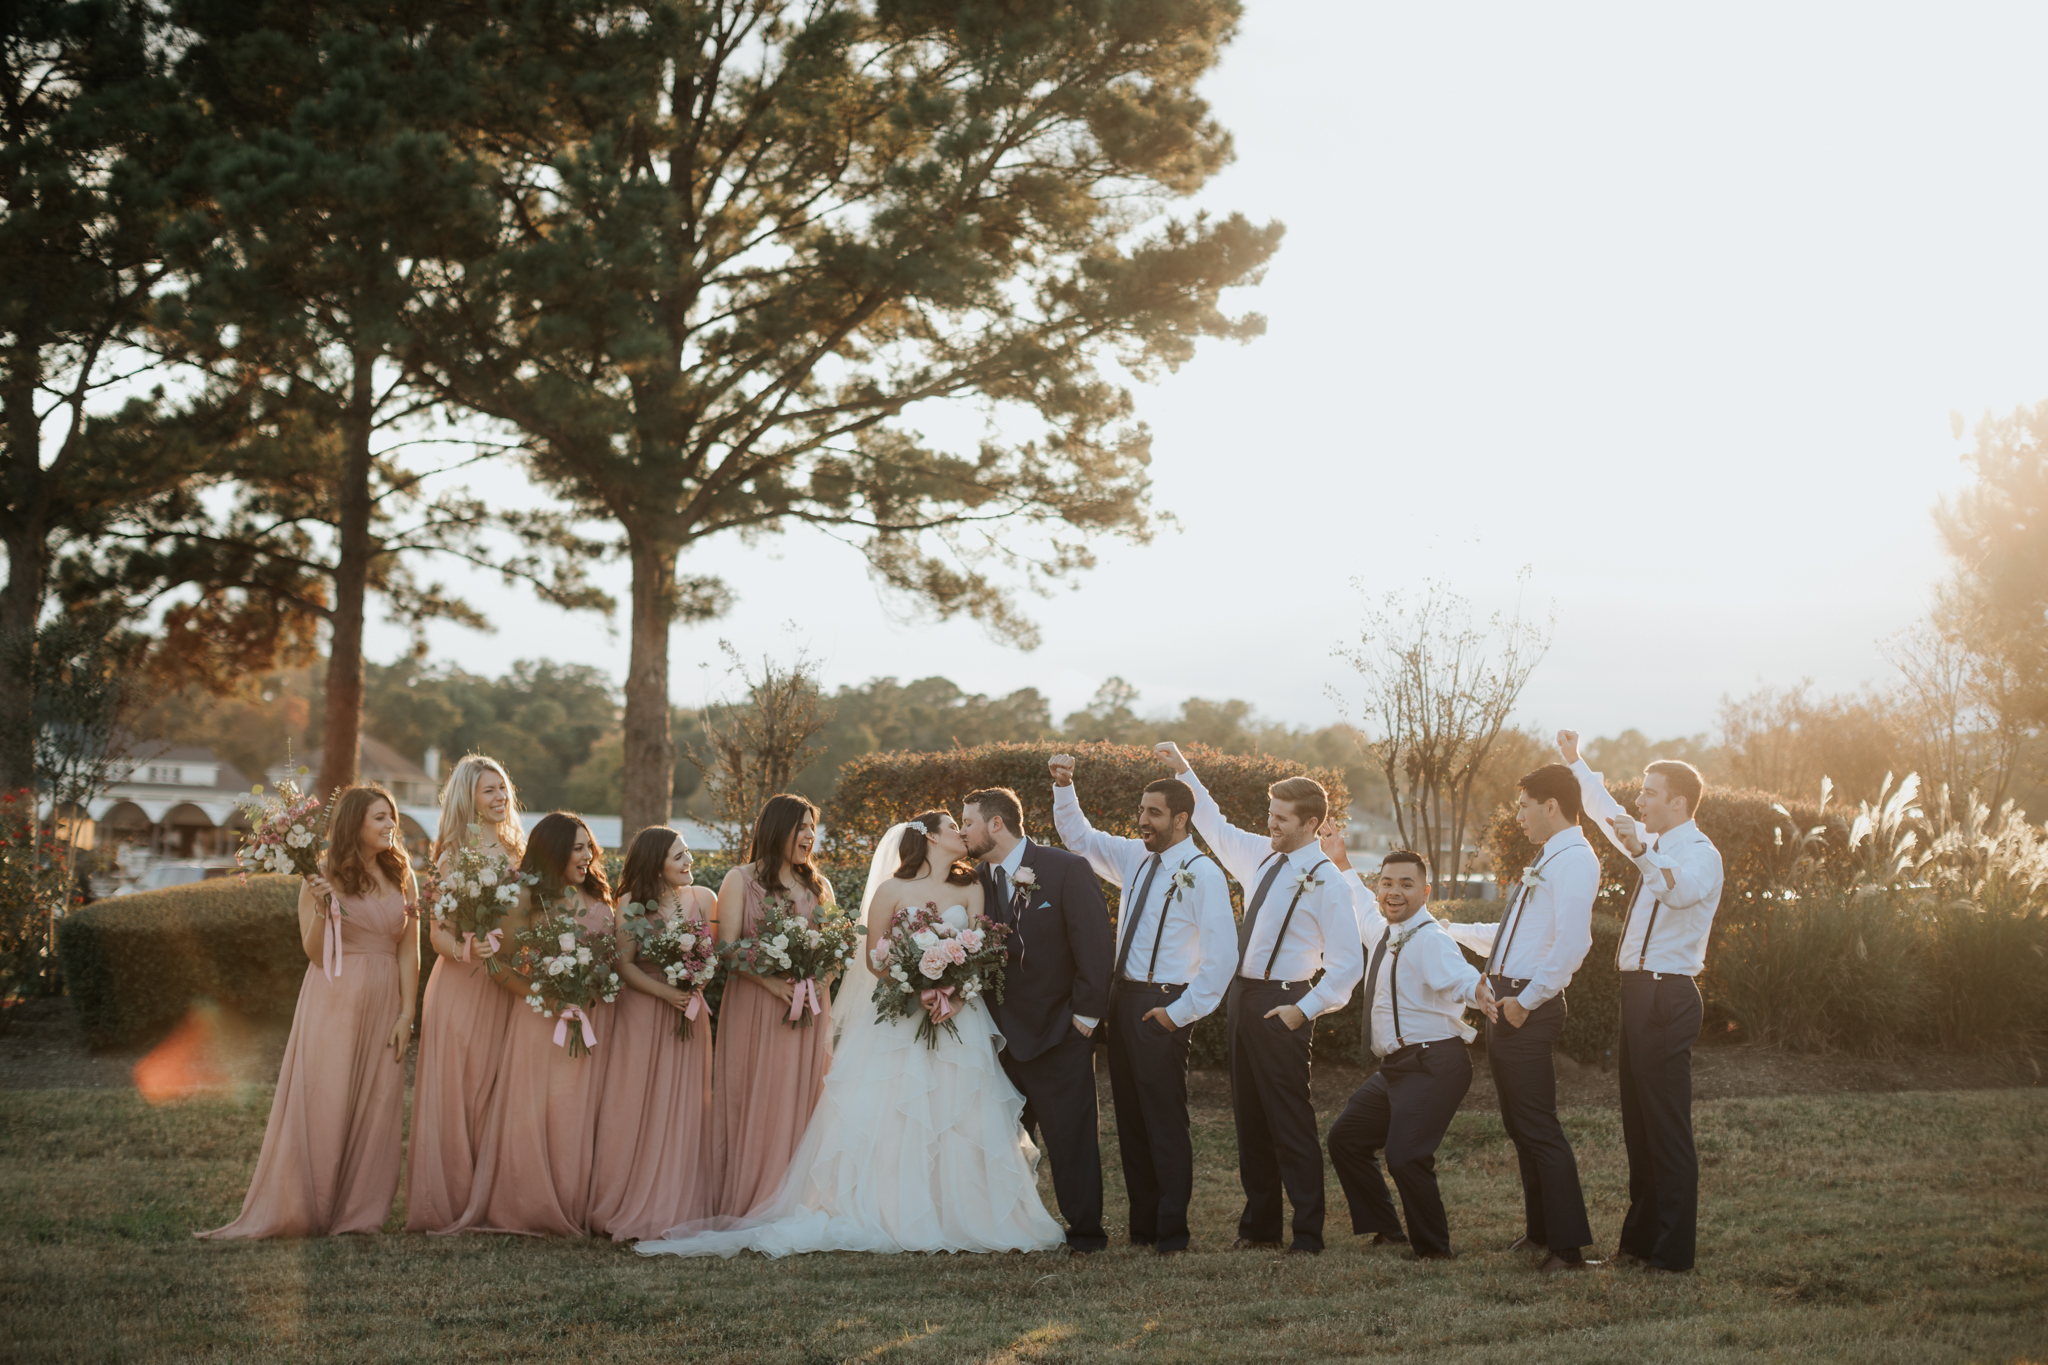 Leah Nicole Photography - Houston Wedding Photographer-Lake Conroe Wedding- Houston Wedding Photographer-36.jpg